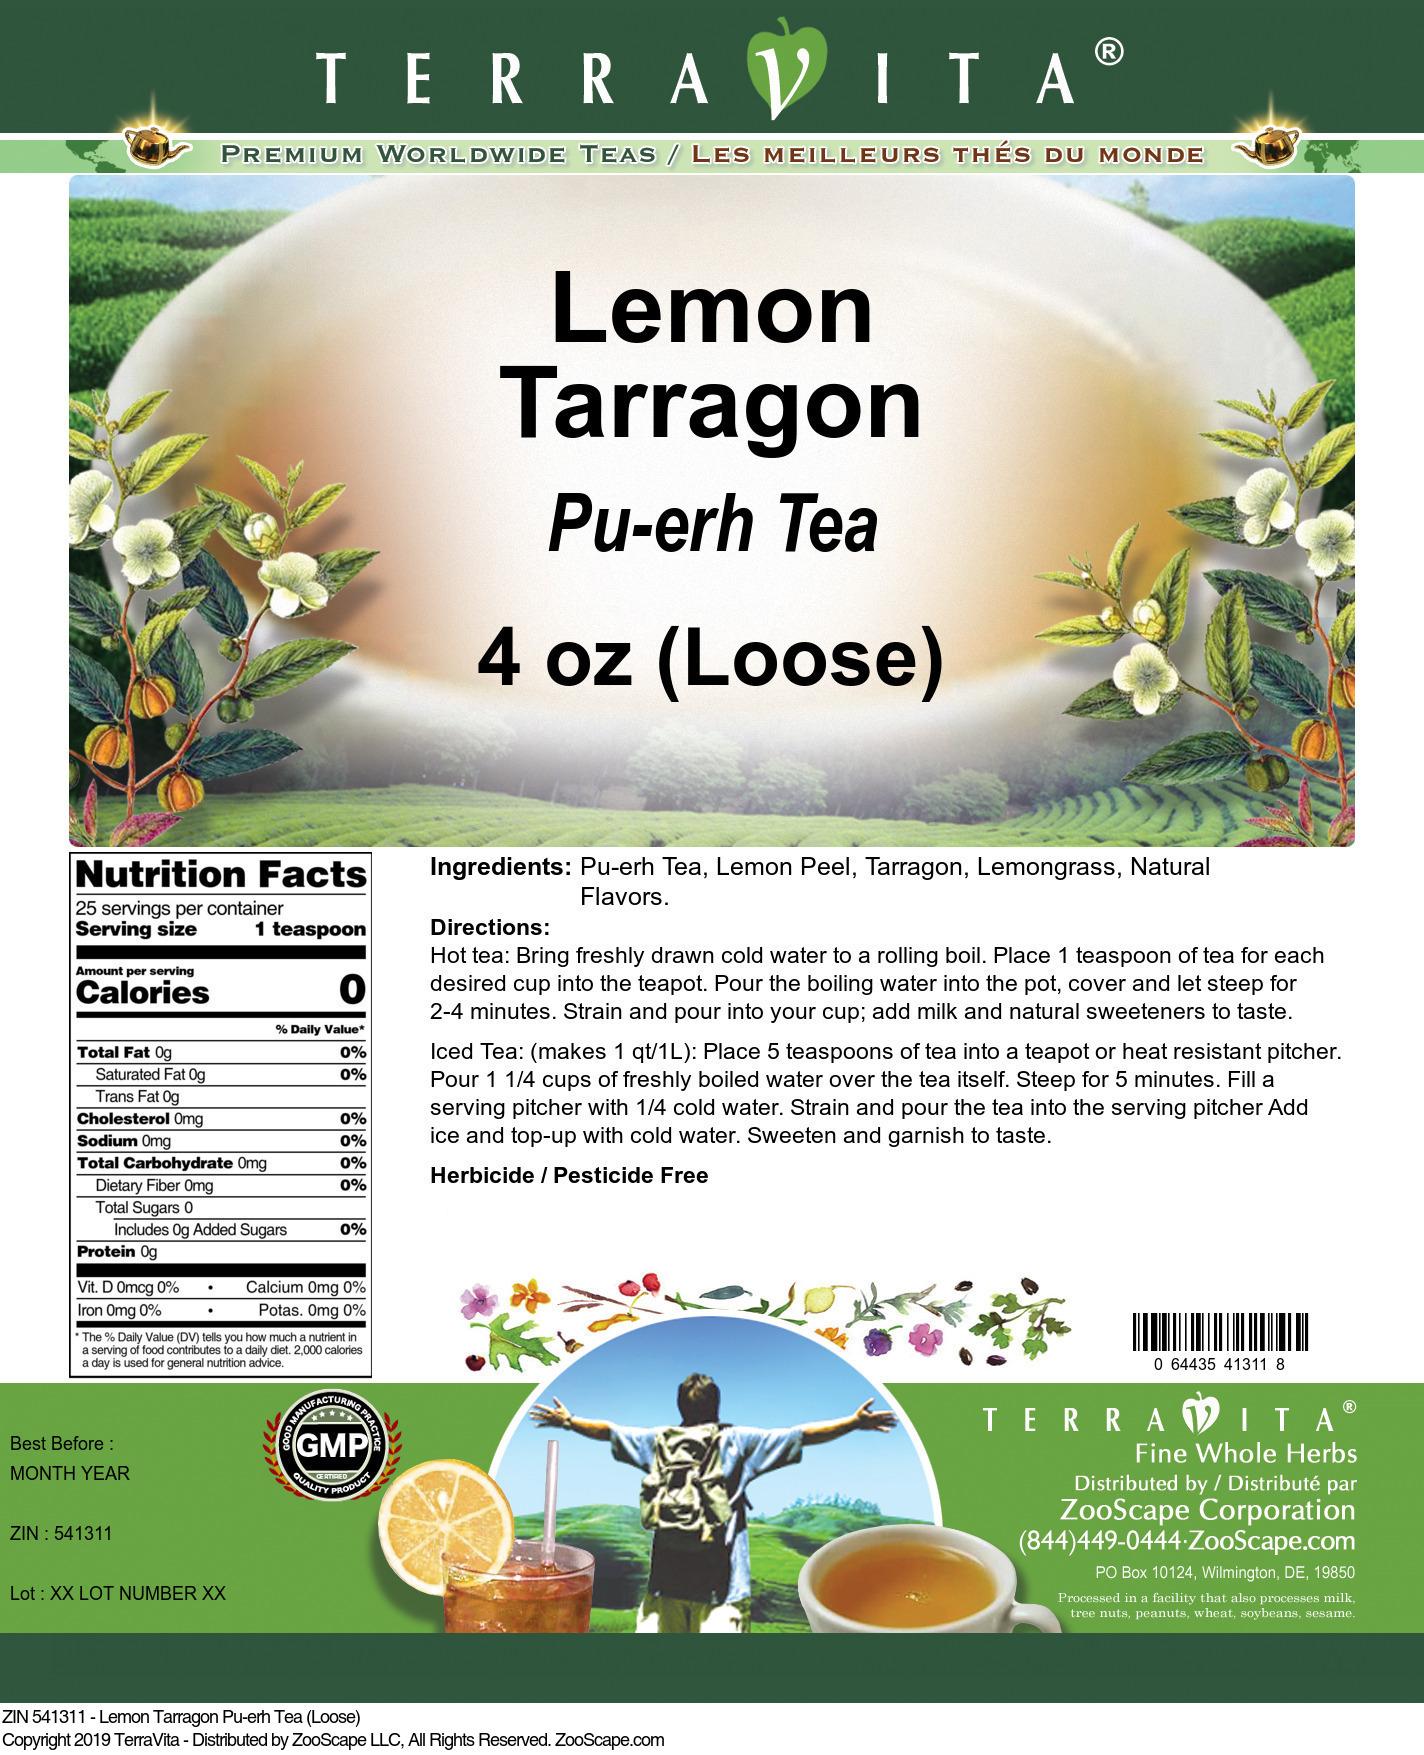 Lemon Tarragon Pu-erh Tea (Loose)